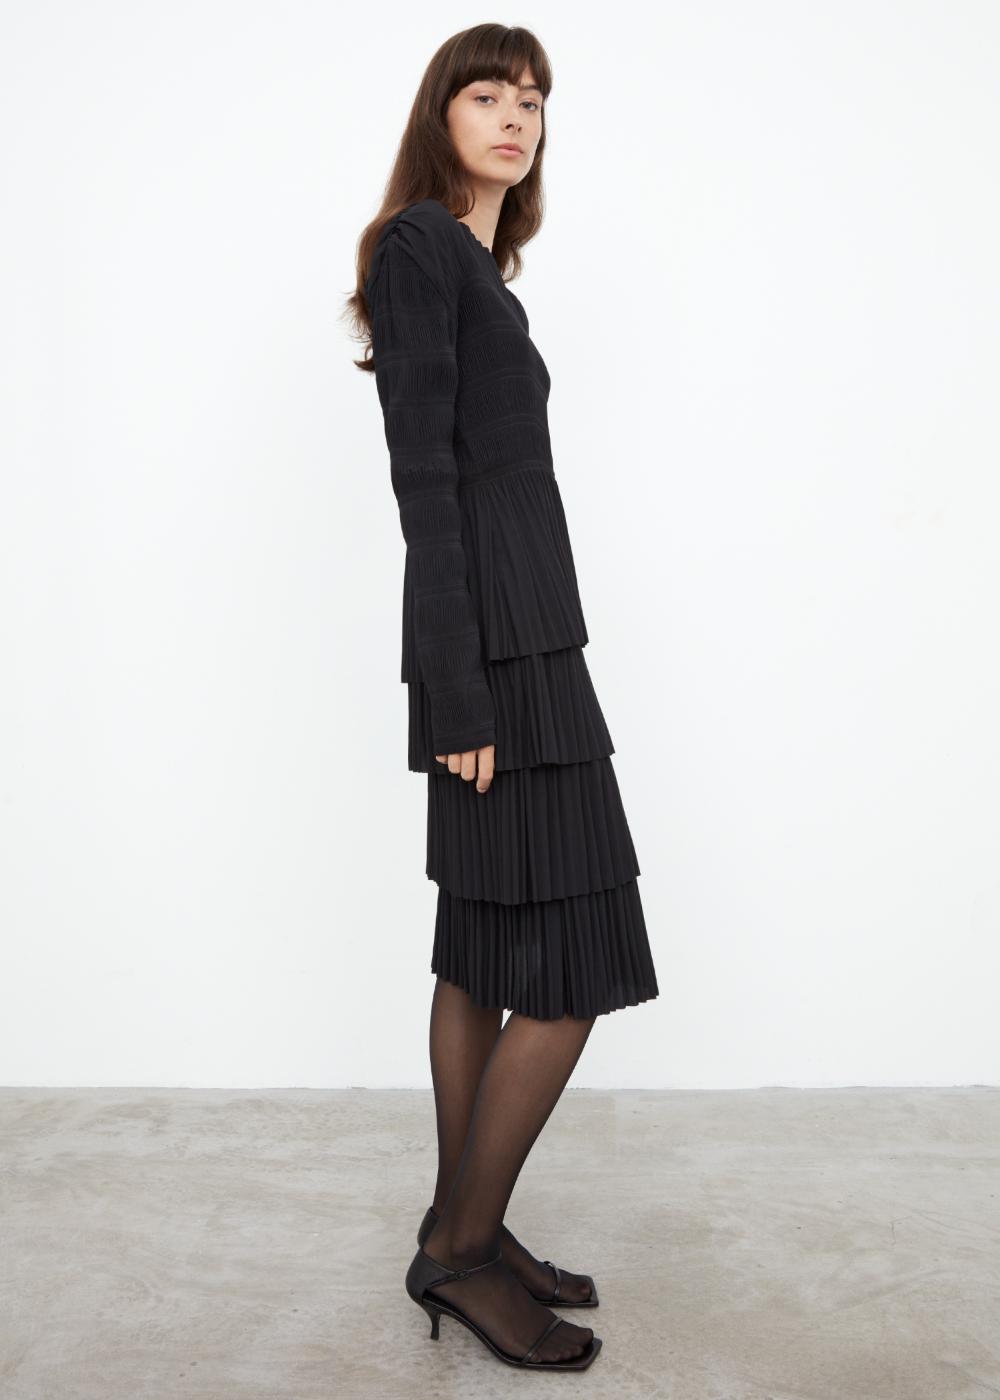 Dresses Skirts Dresses Dress Skirt Fashion [ 1400 x 1000 Pixel ]